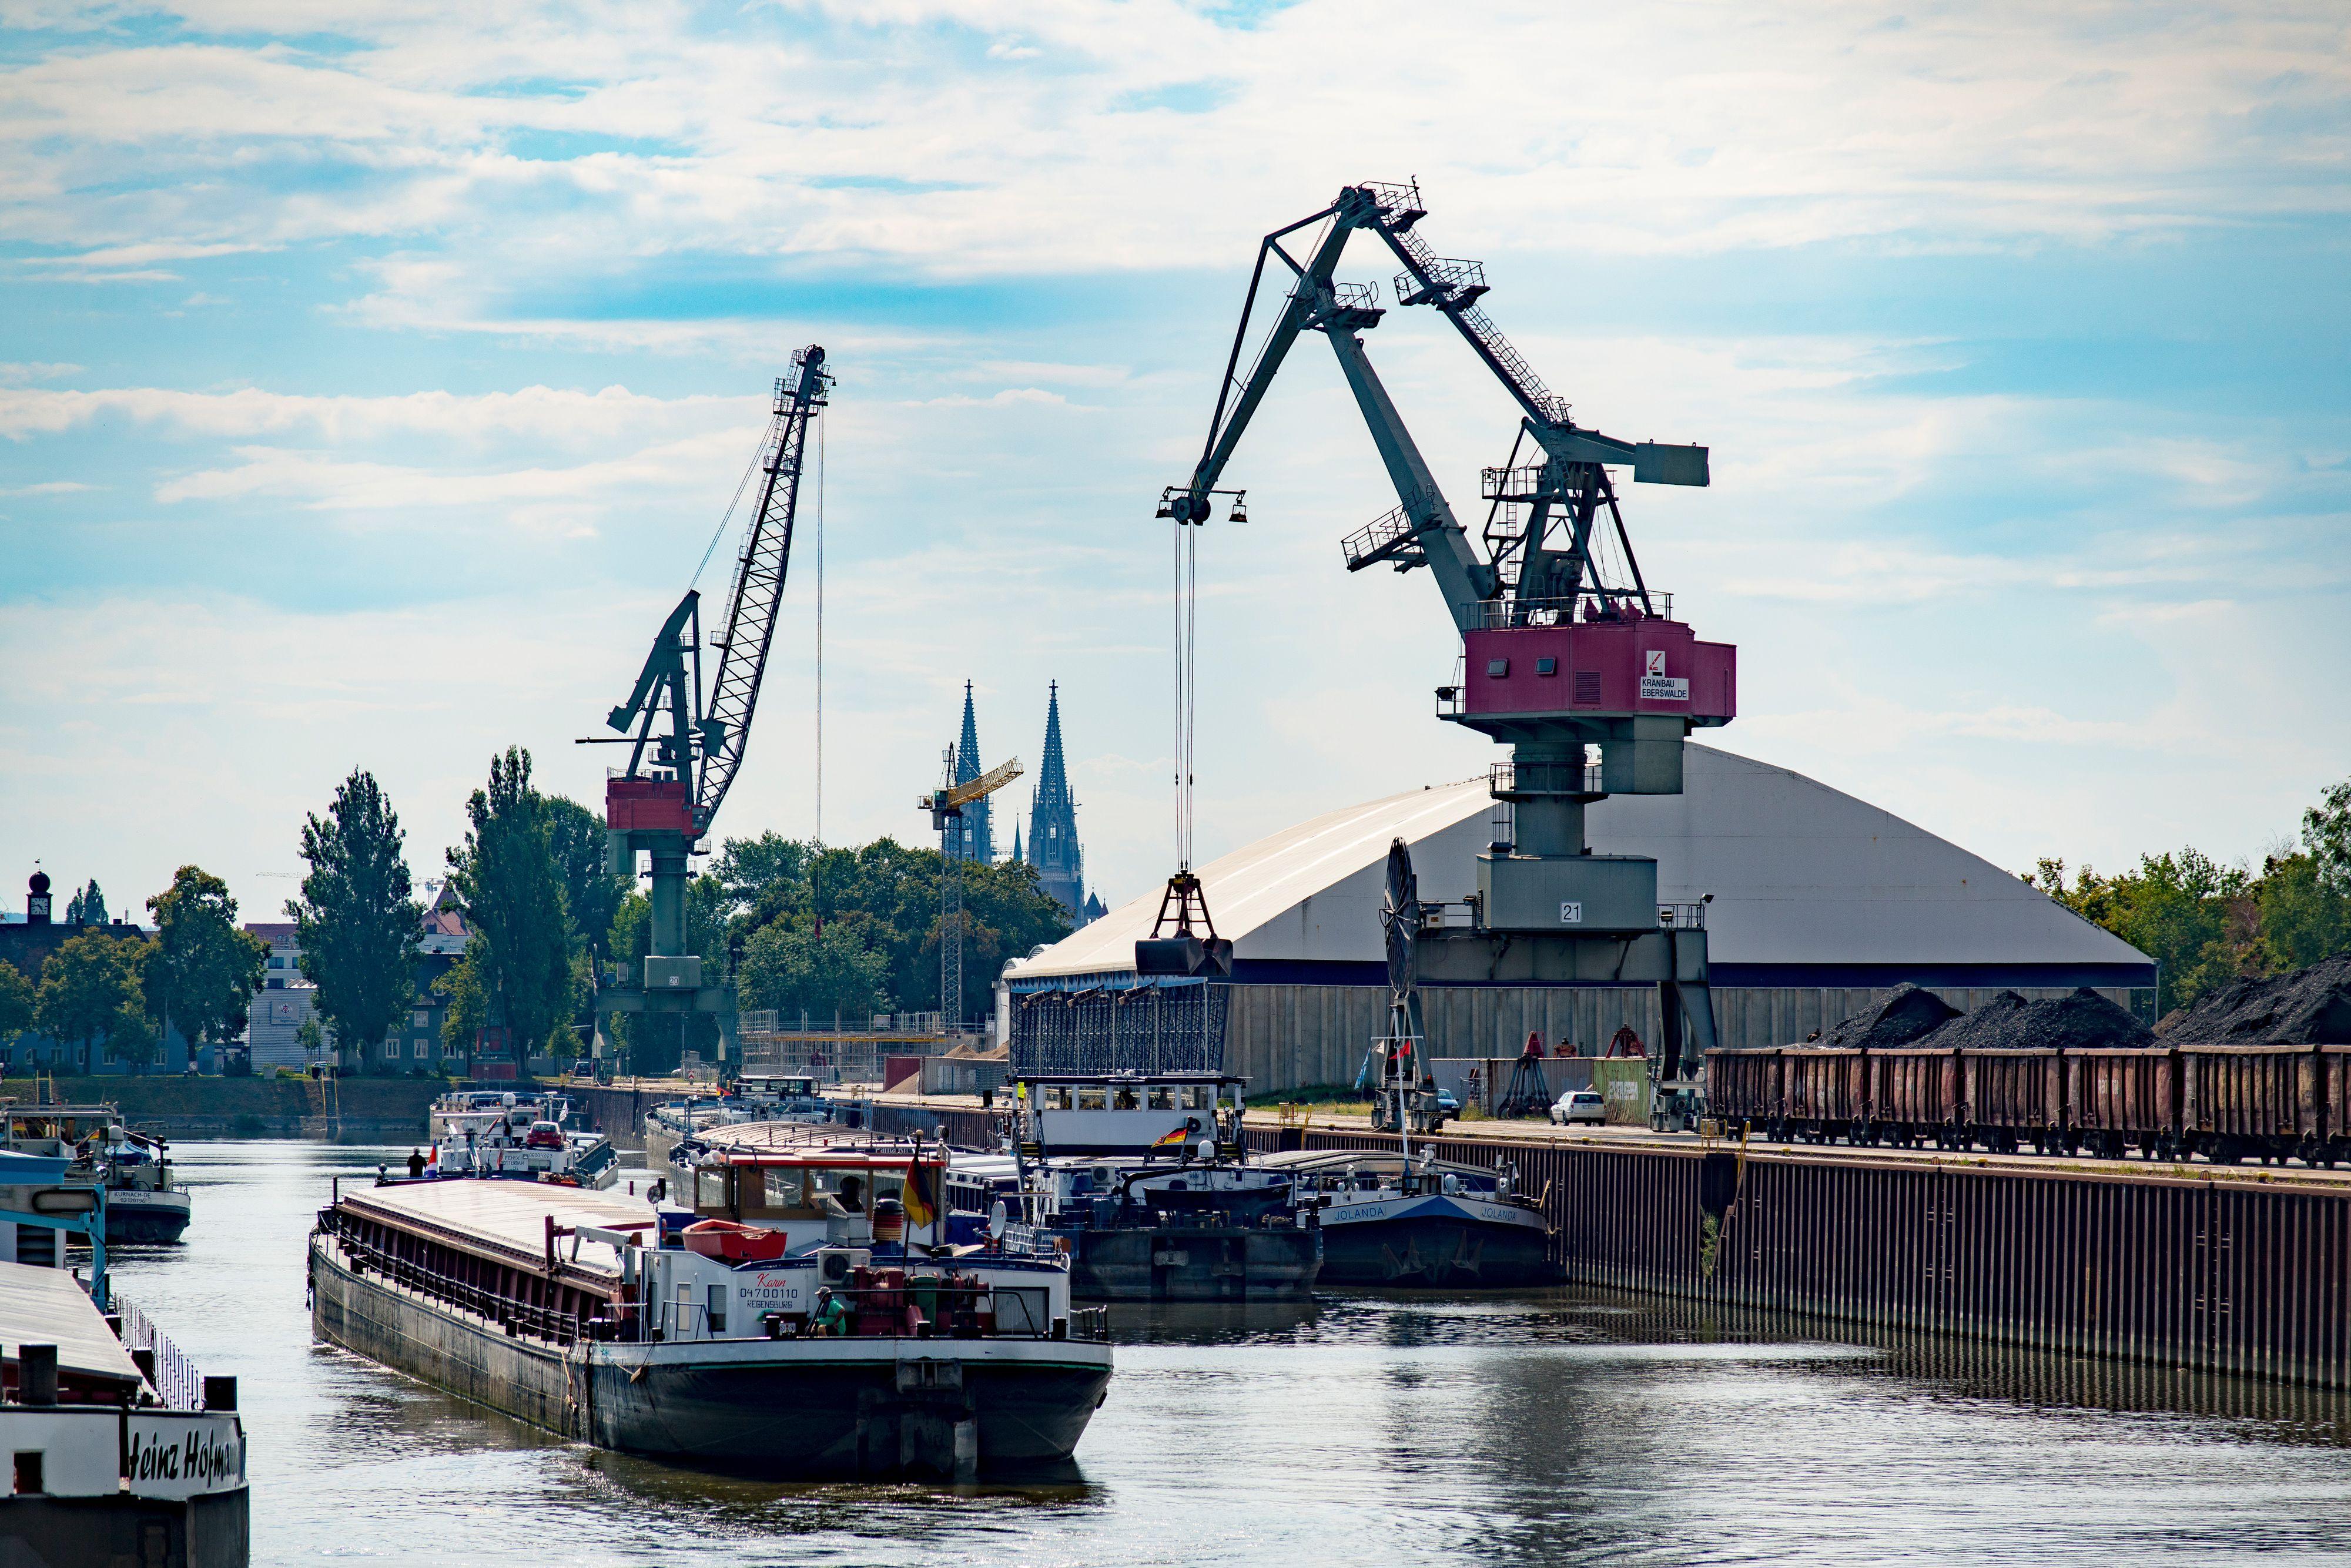 Regensburg Hafen